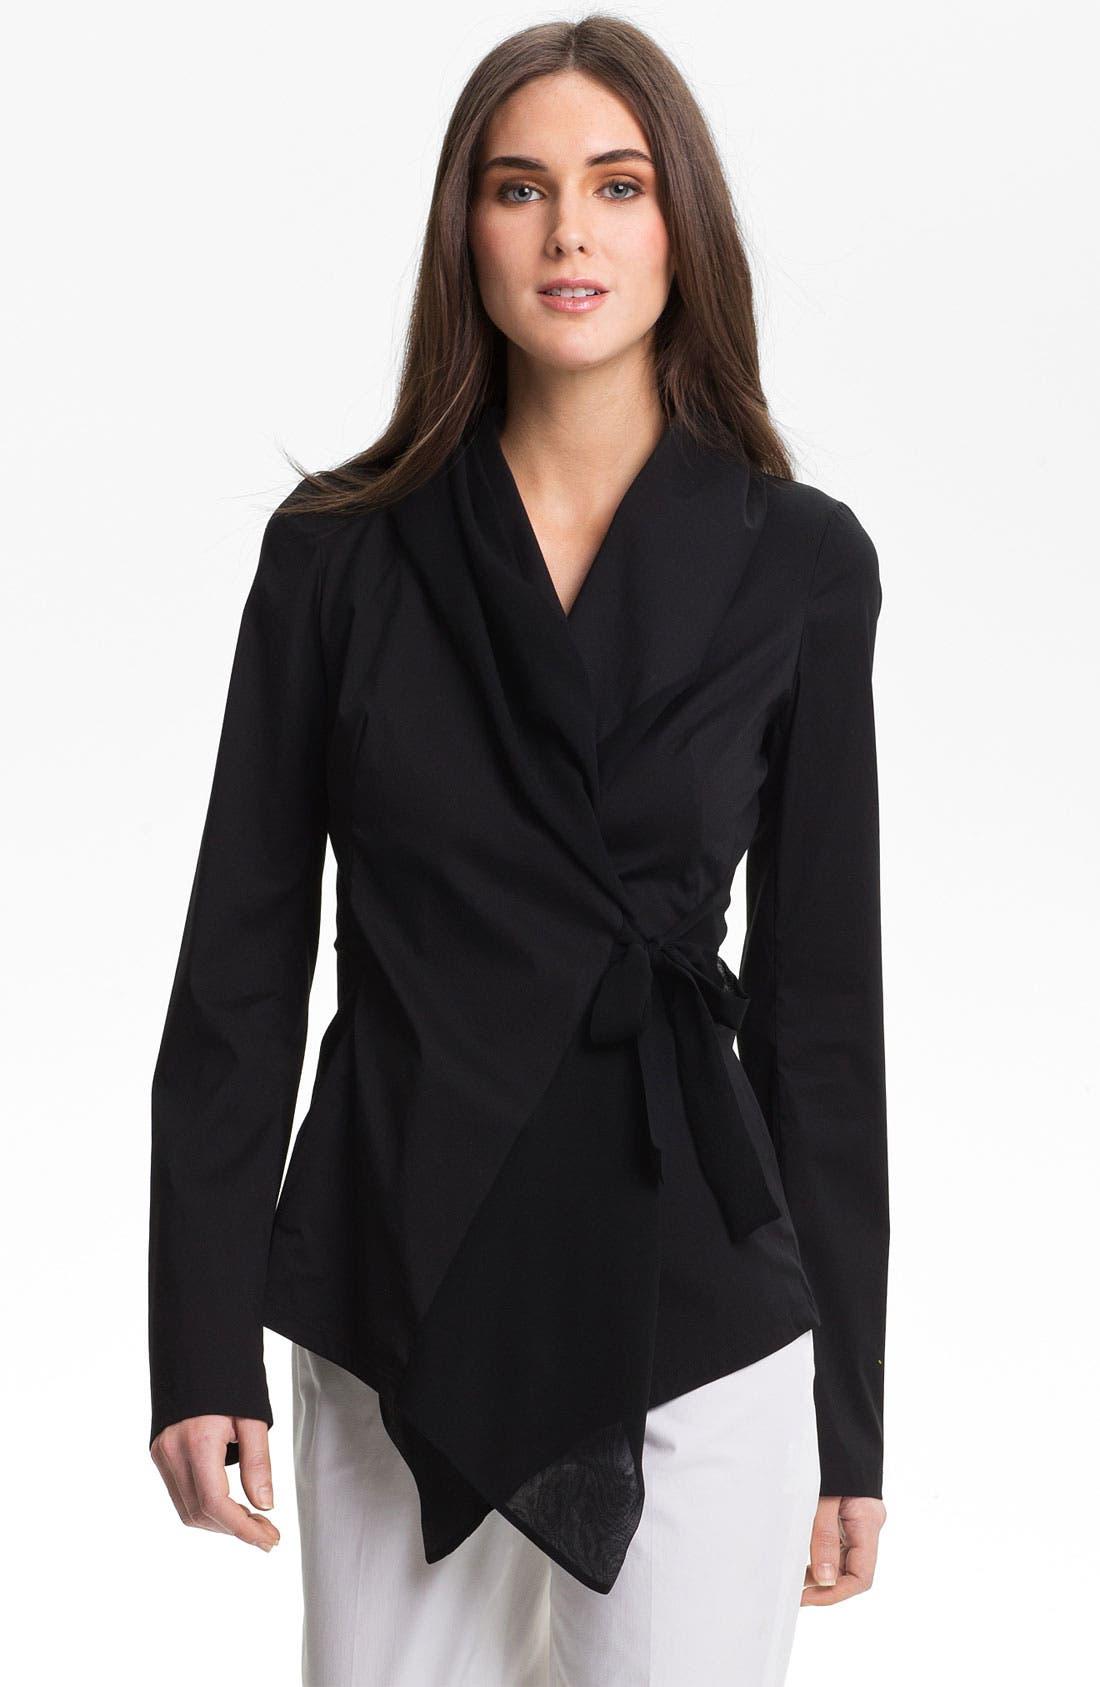 Main Image - Lafayette 148 New York 'Bethany' Italian Stretch Cotton Blend Jacket